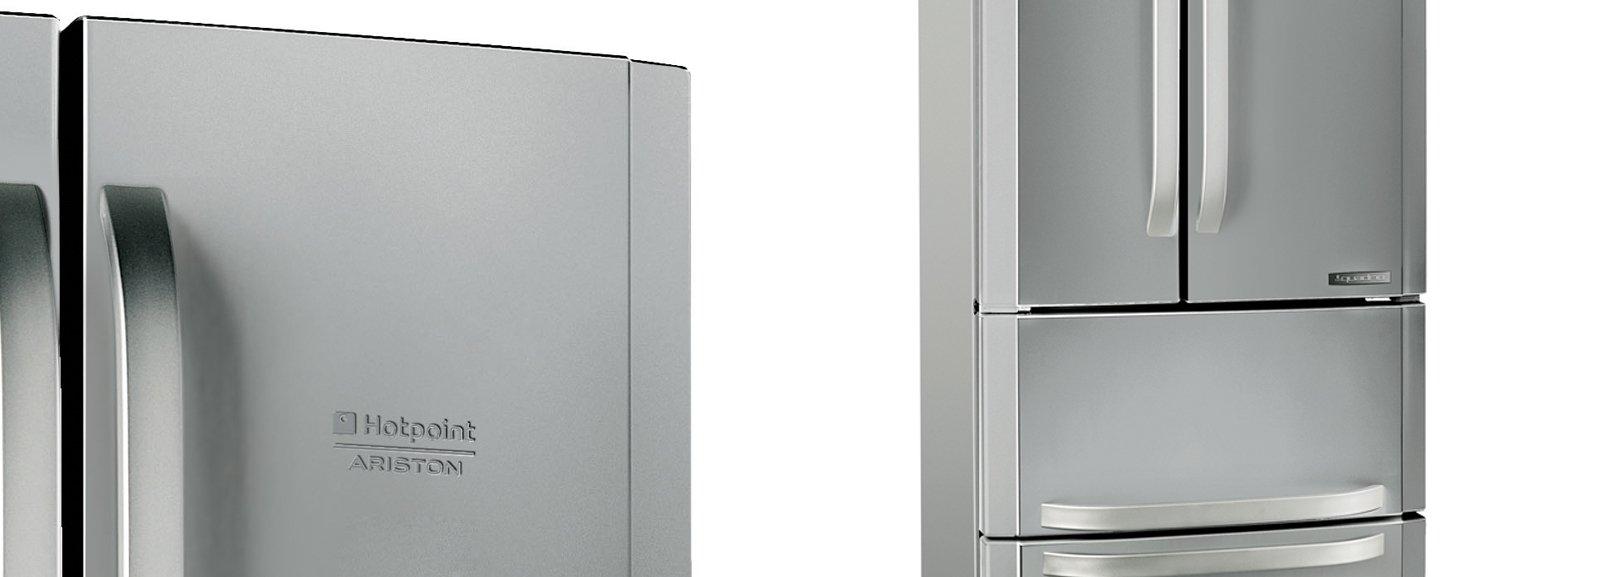 Frigo e congelatore modelli maxi a tre porte side by